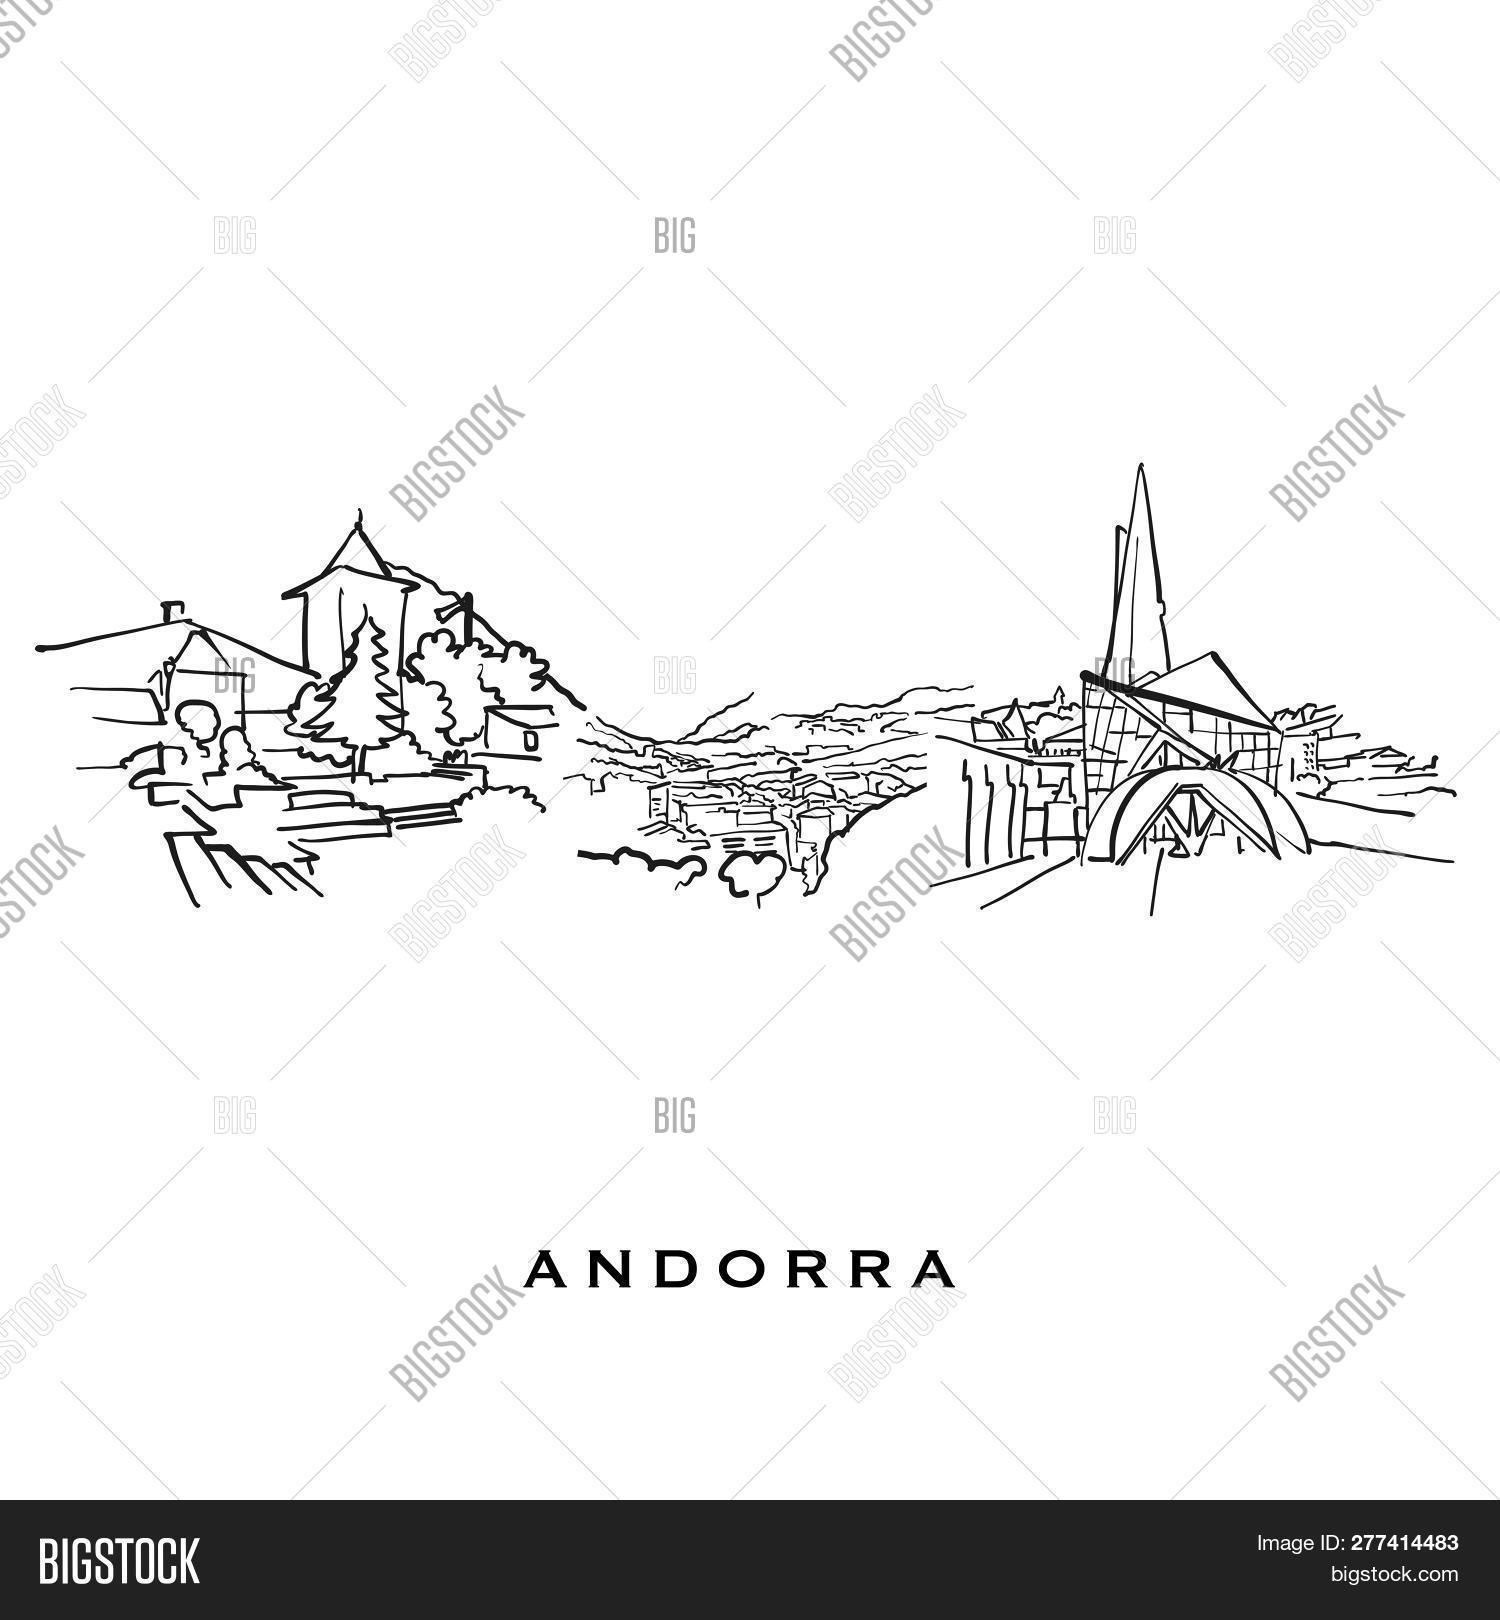 Andorra Famous Vector & Photo (Free Trial) | Bigstock